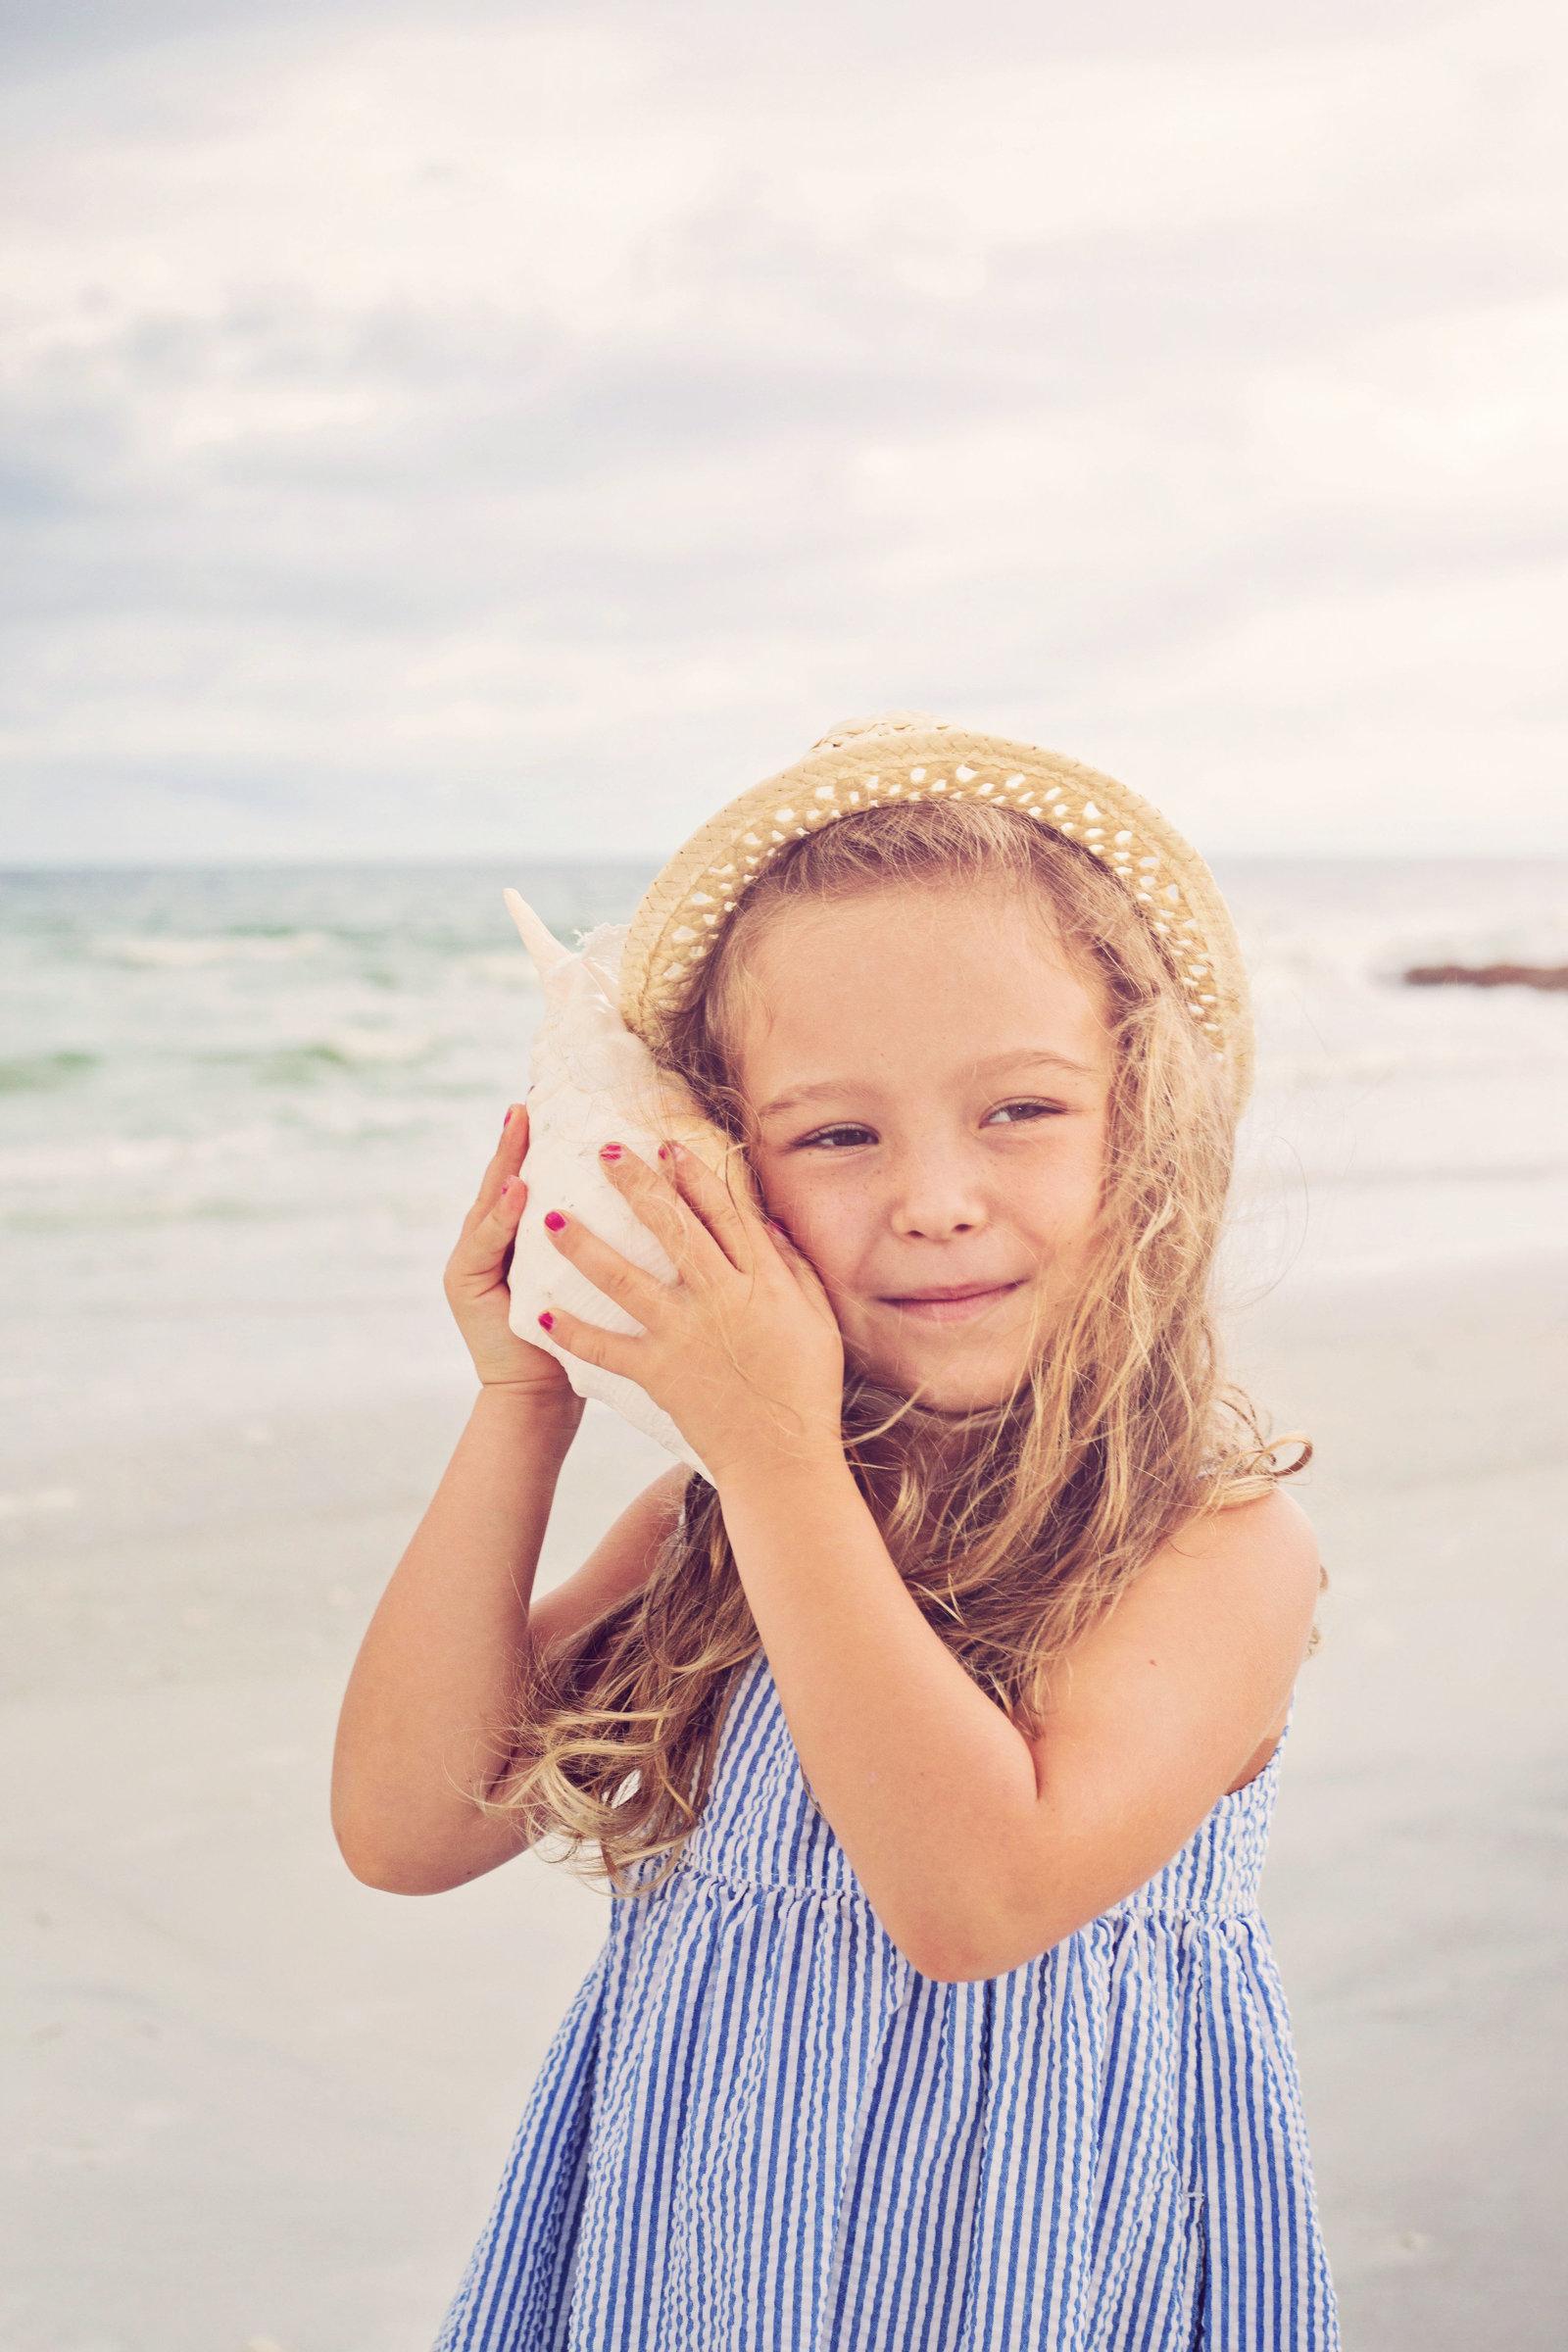 Beach Pics 2015 (29 of 50)d